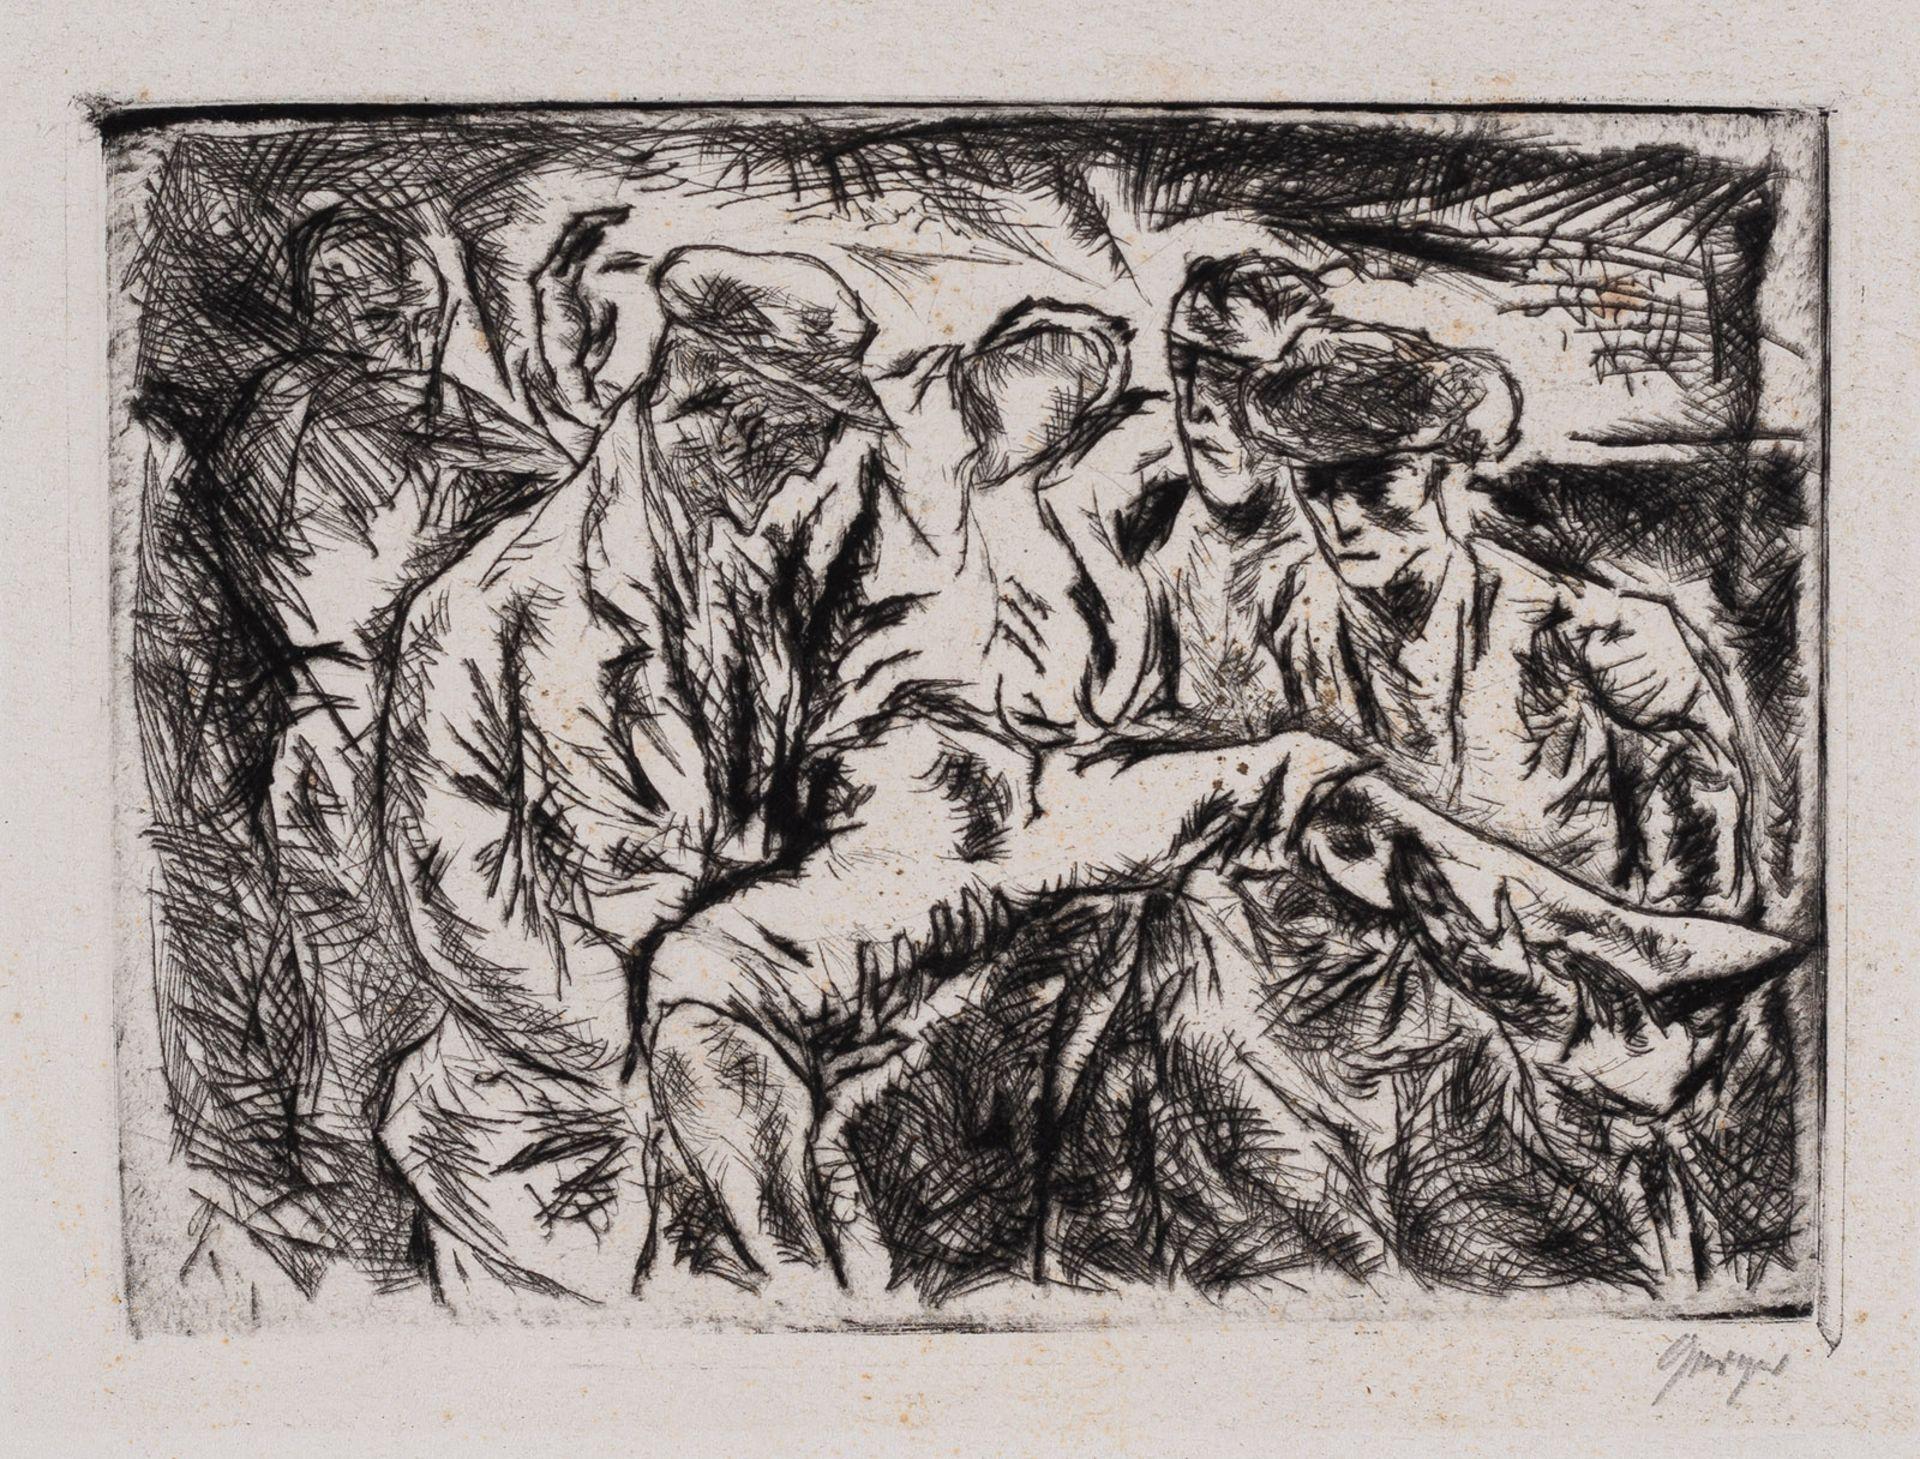 Geiger, Willi - Image 19 of 22